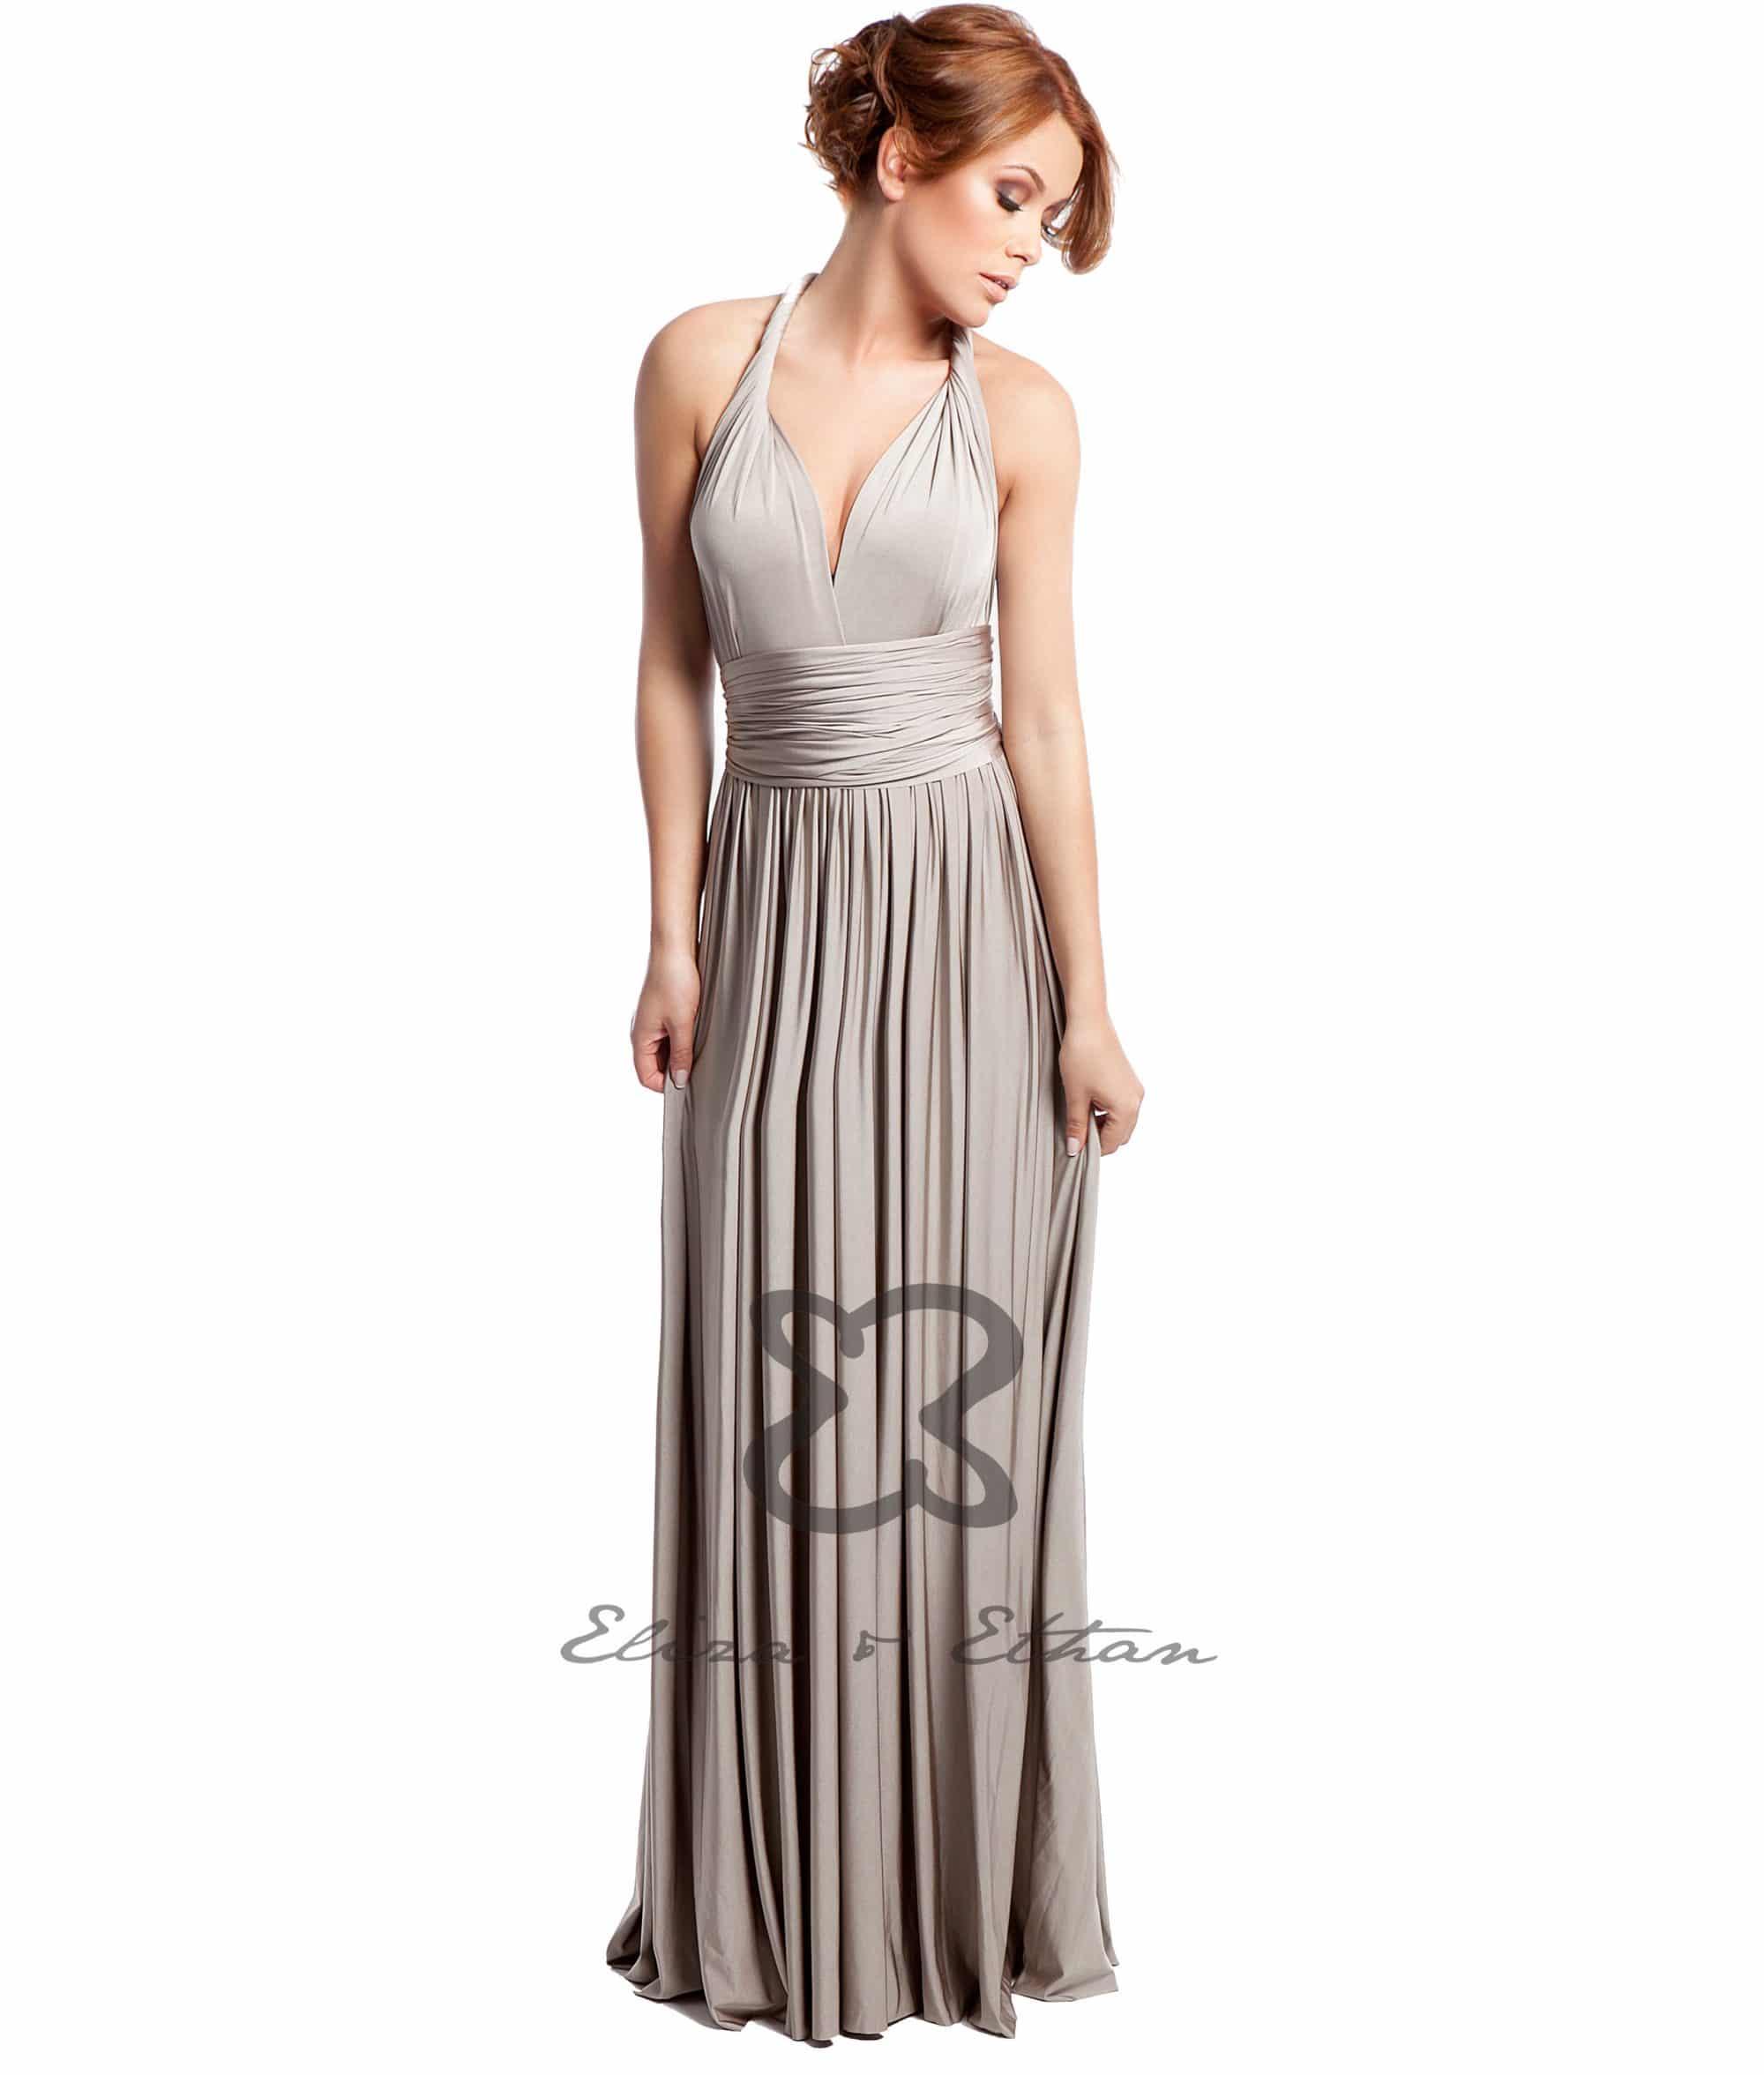 Eliza & Ethan Champagne Multiwrap Dress Alila